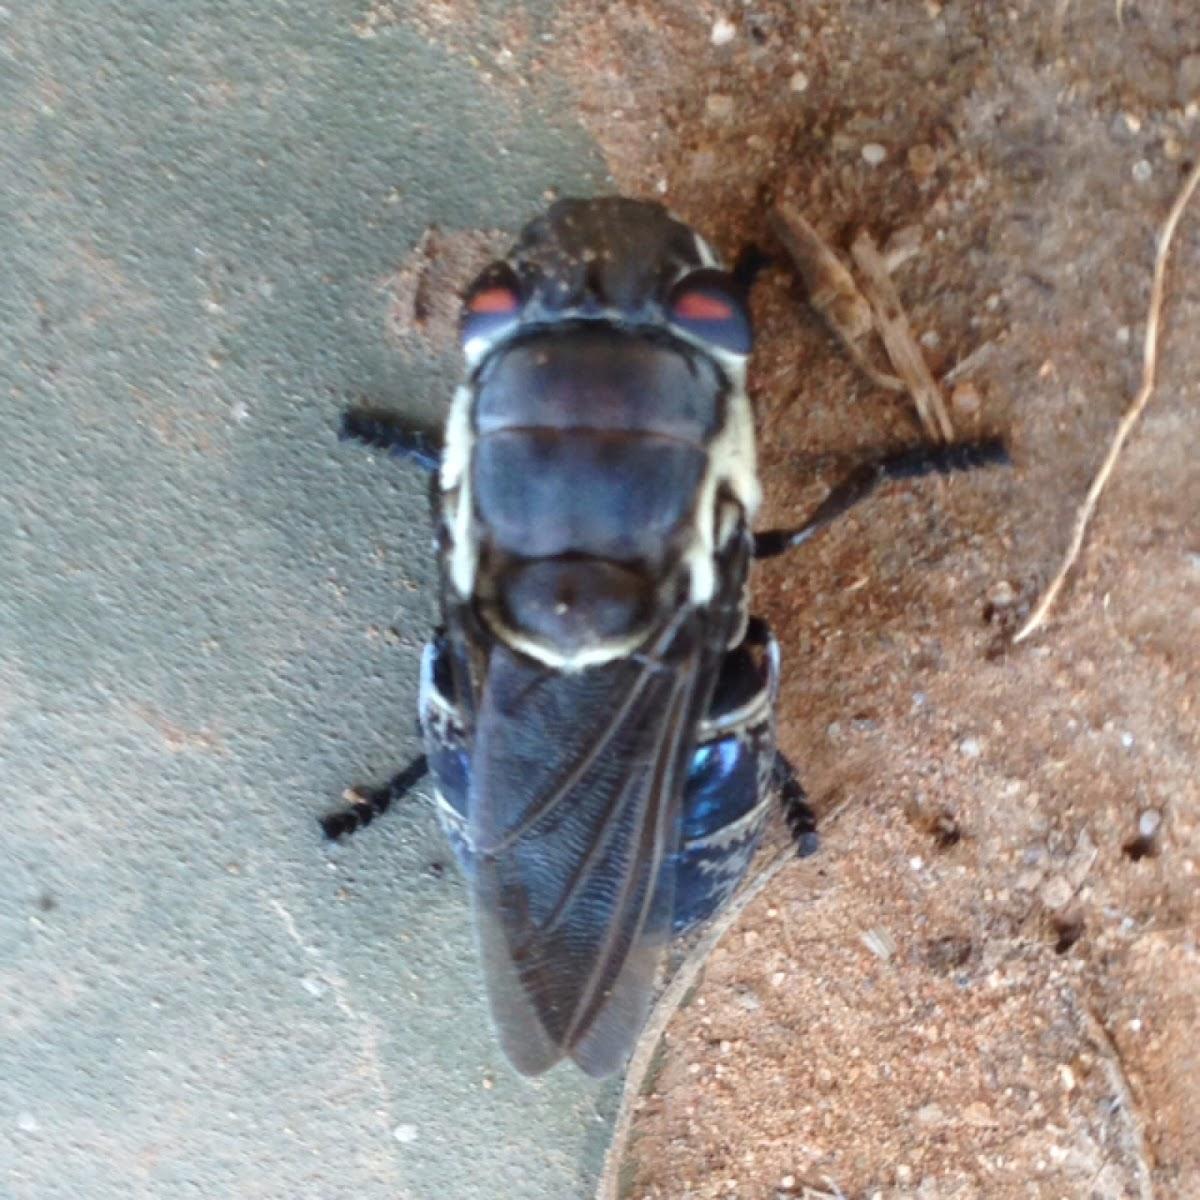 Rabbit Botfly